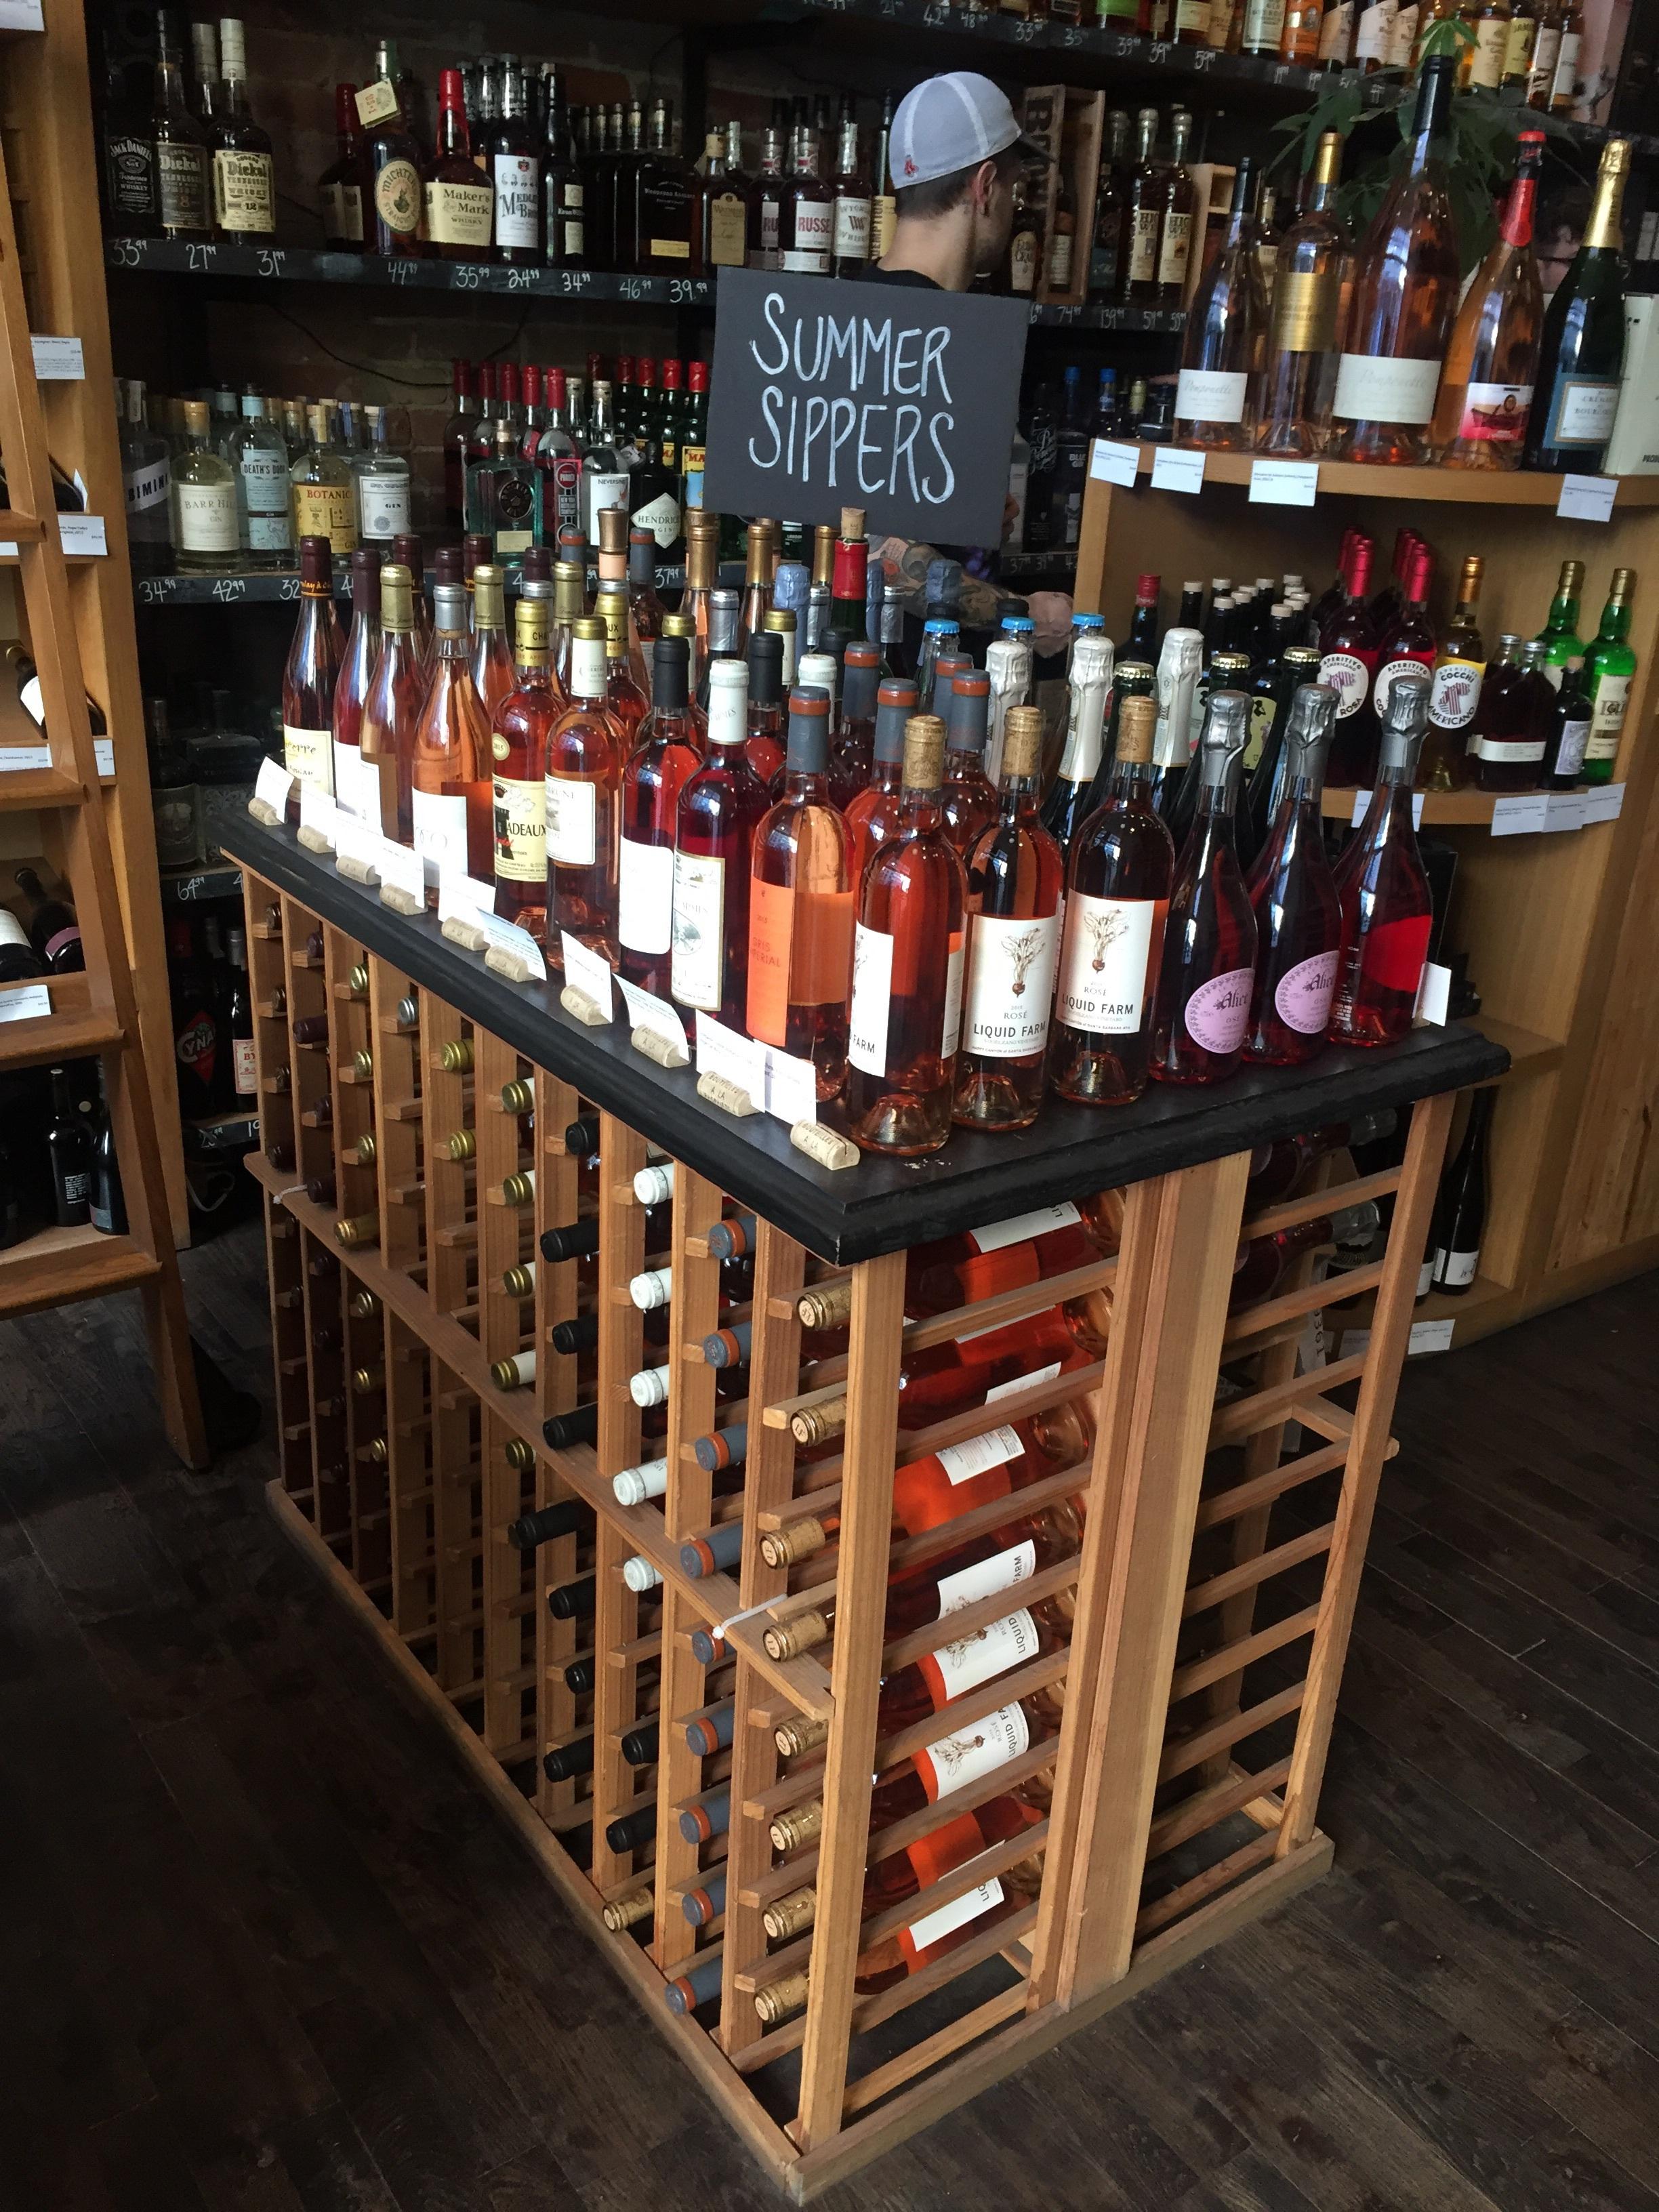 Take your pick -  Flatiron Wines & Spirits, 929 Broadway, New York, NY 10010